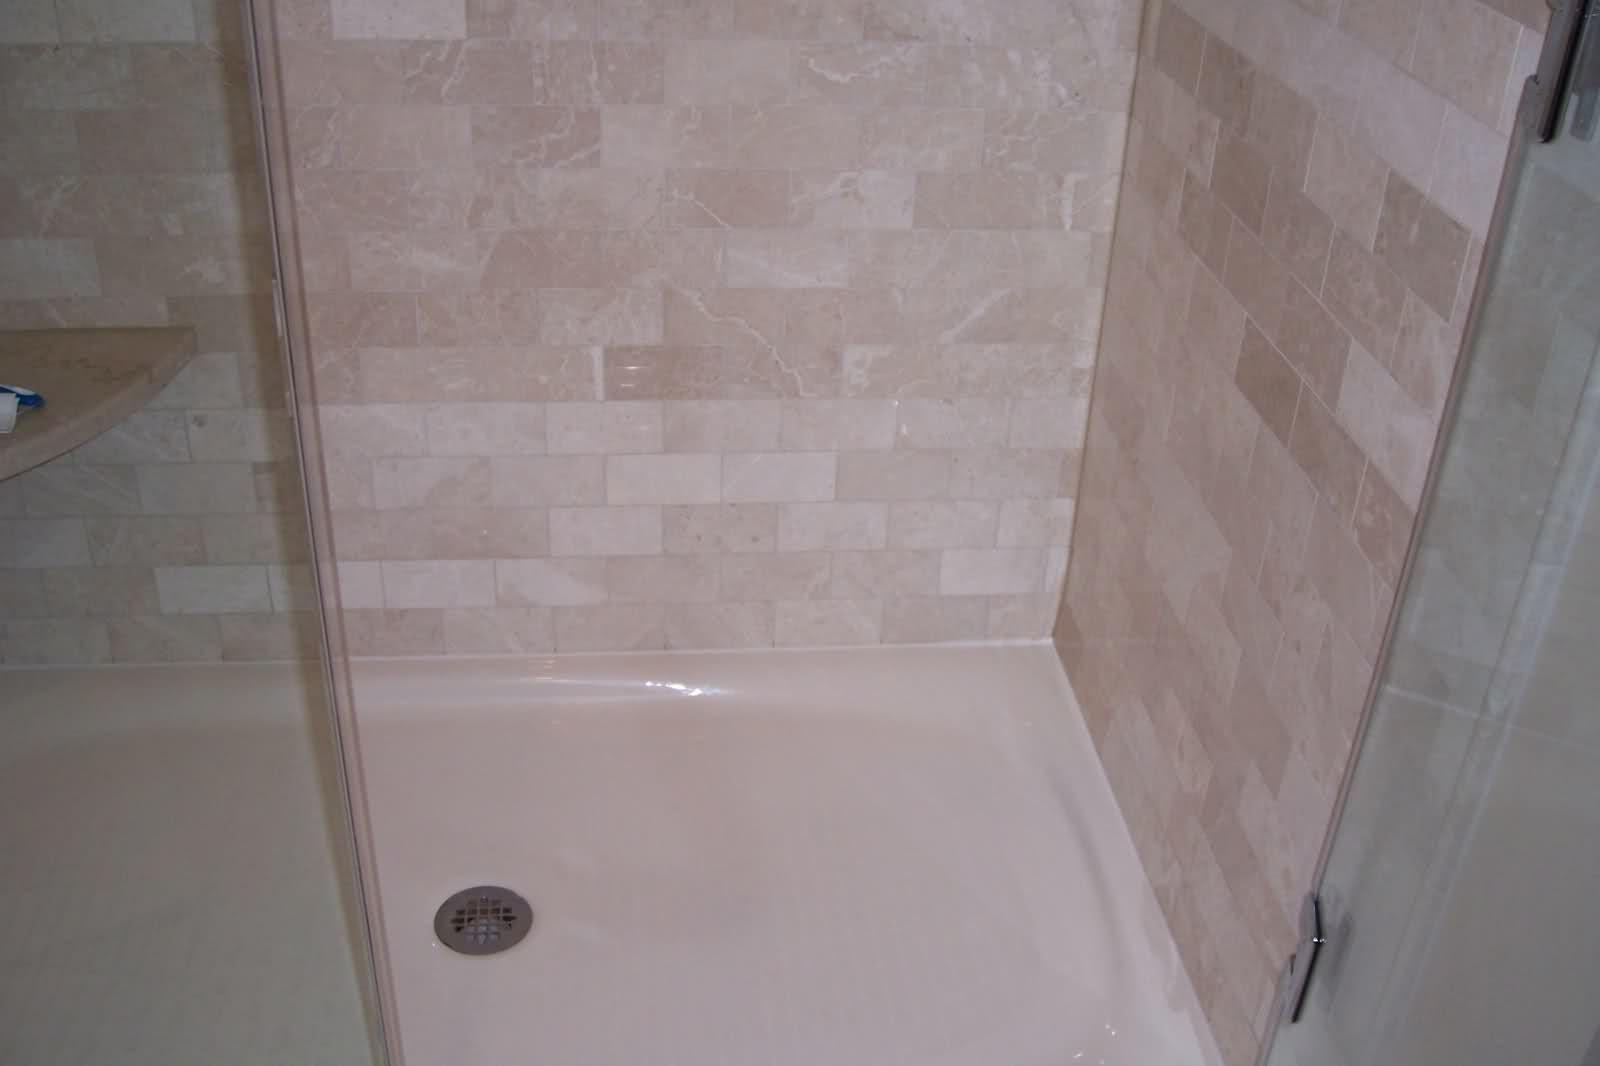 Kohler Salient Corner Shelf At Low Height For Legs Marble Subways Frameless Door Cultured Marble Shower Walls Bathroom Wall Tile Fiberglass Shower